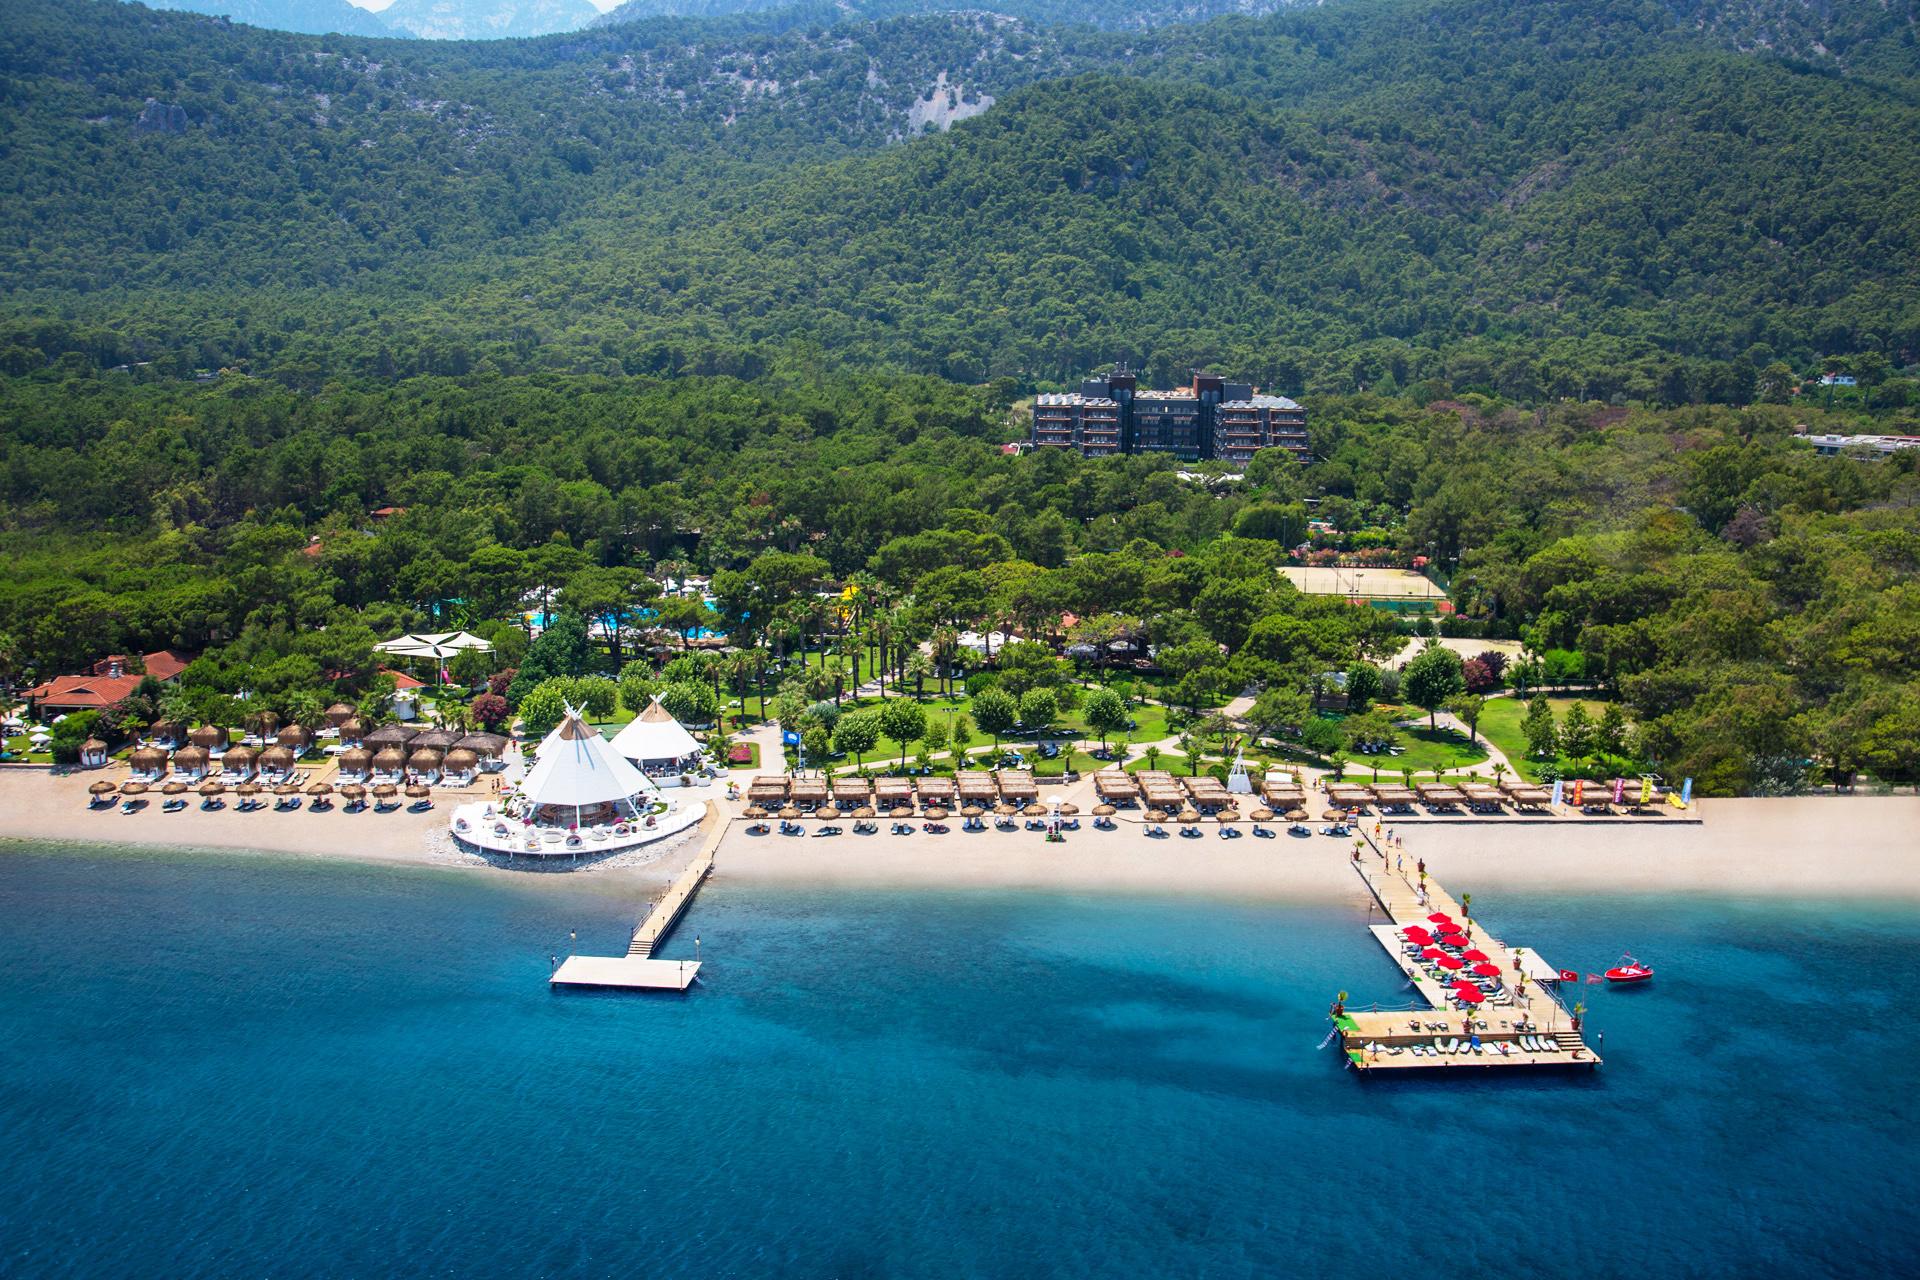 Renaissance Antalya